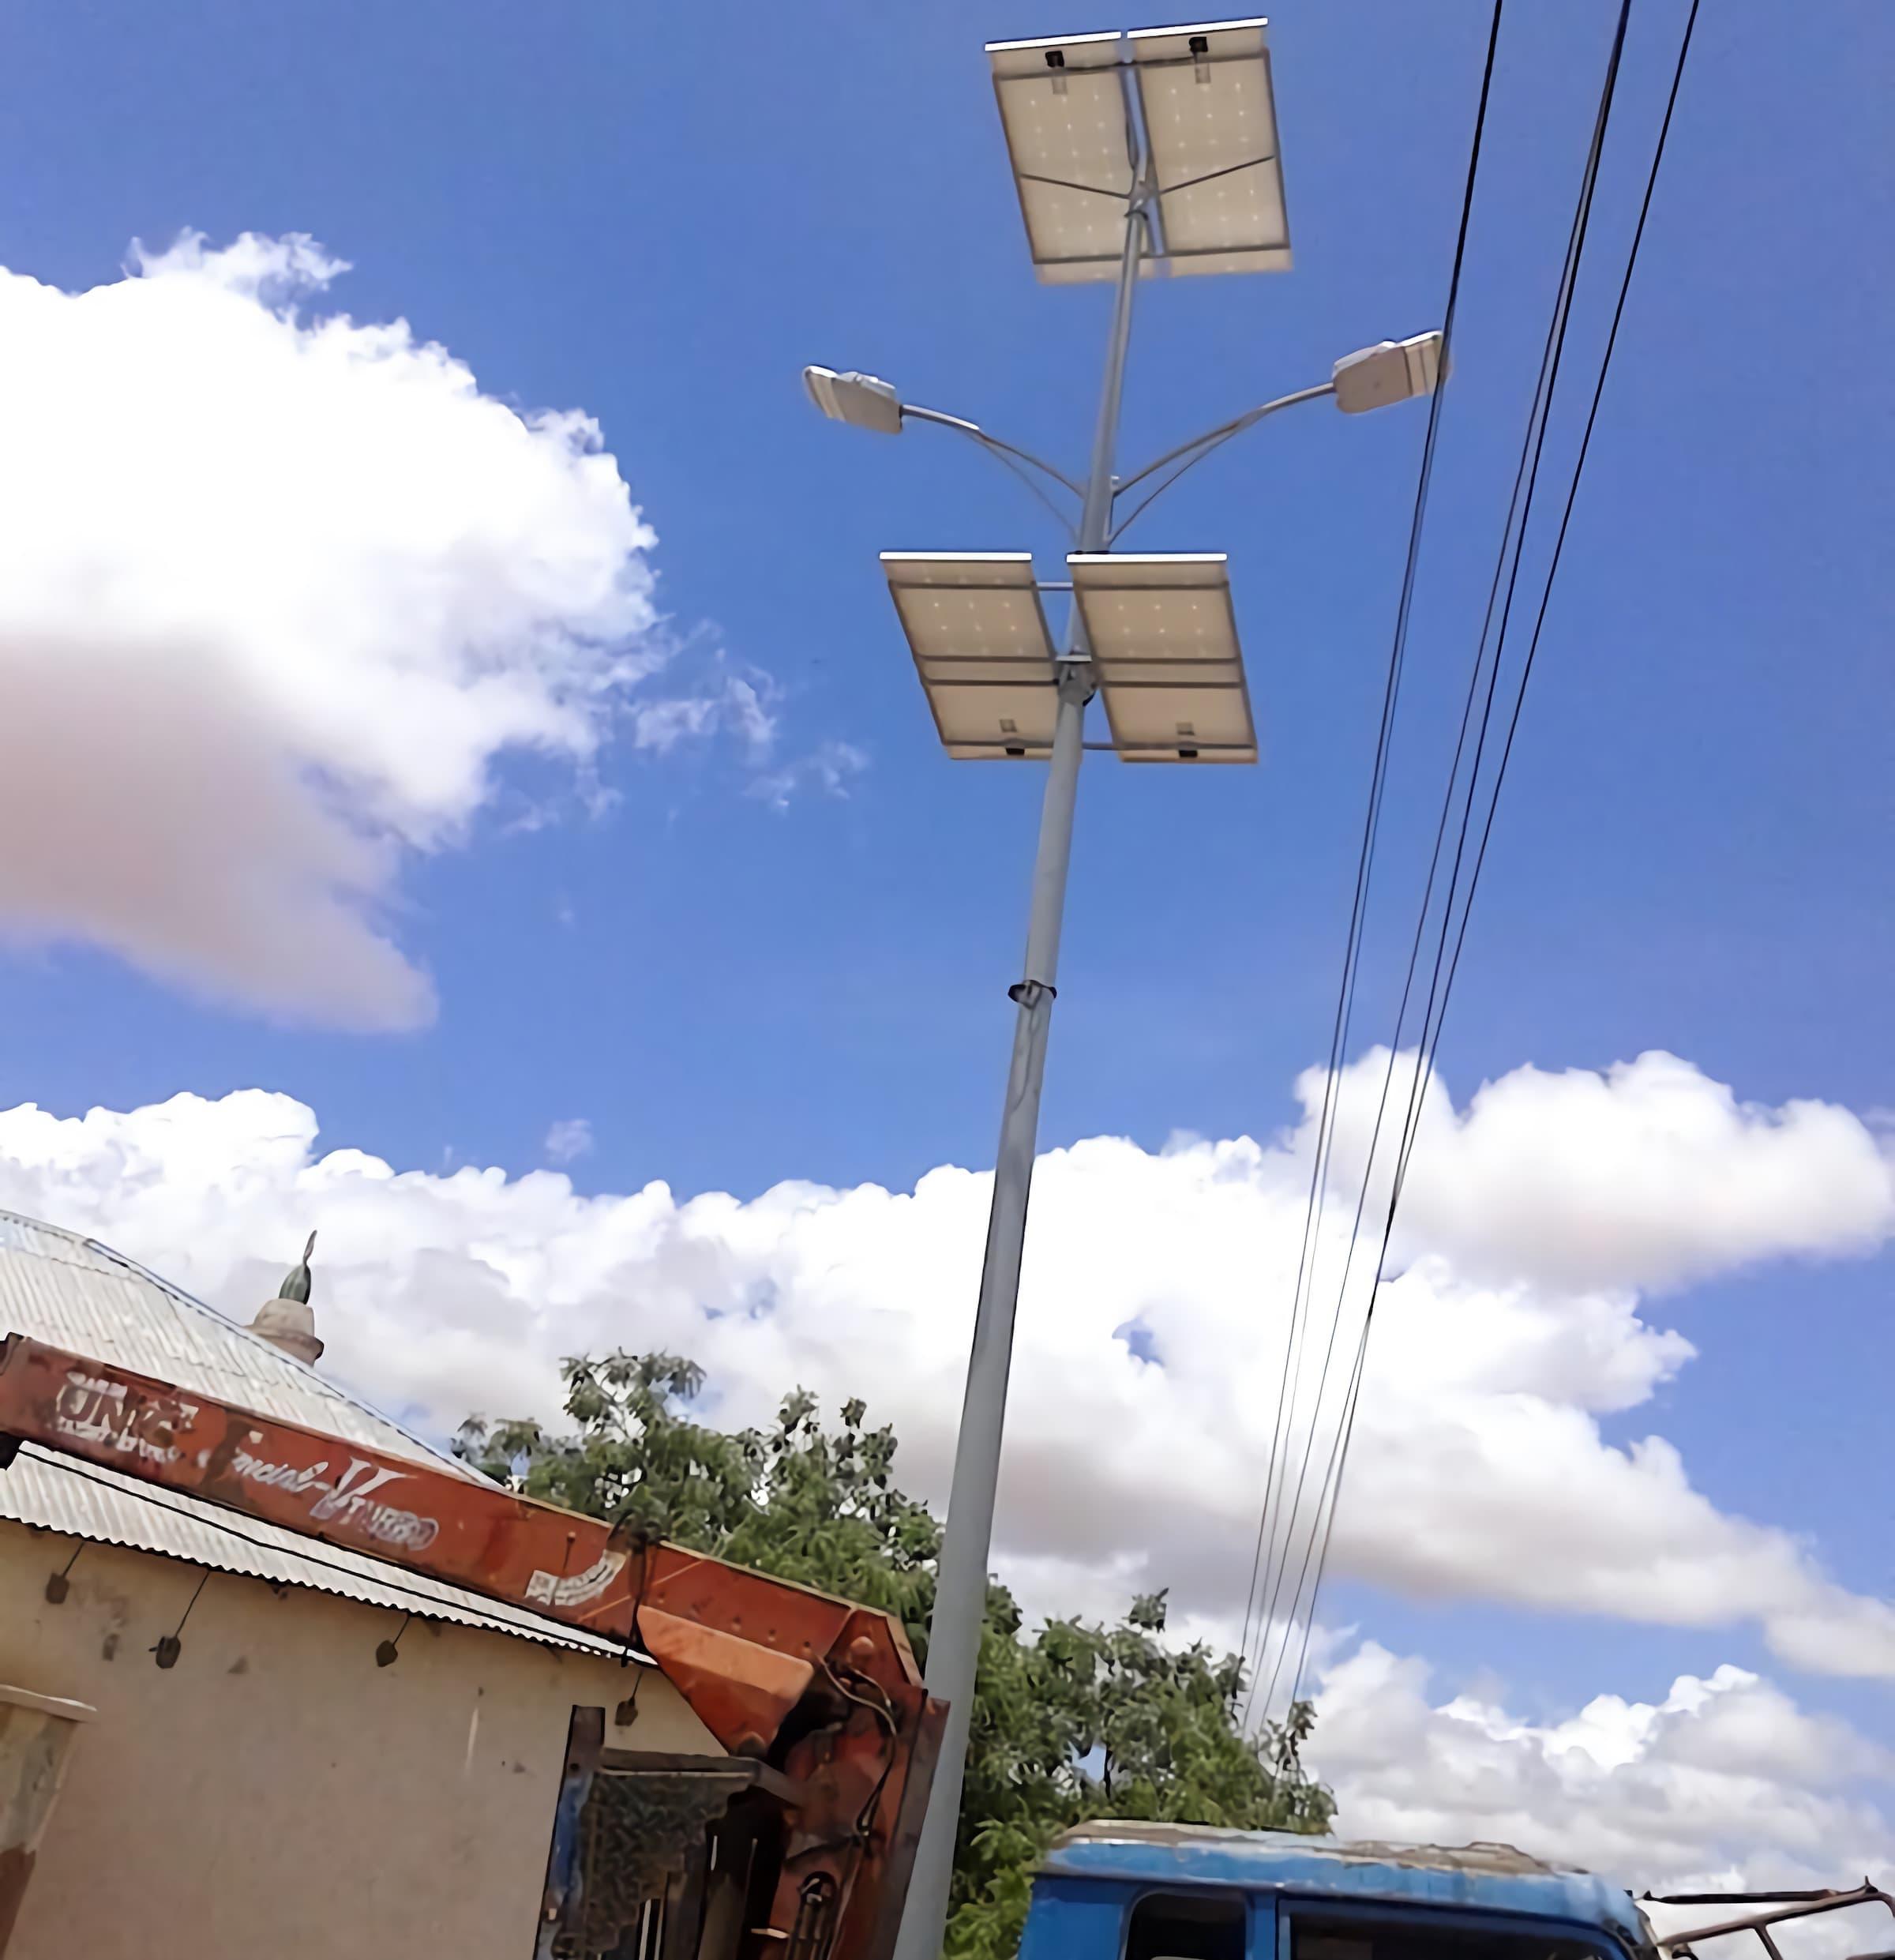 solar-street-light-60-watts-installation-in-Mogadishu-of-Somalia